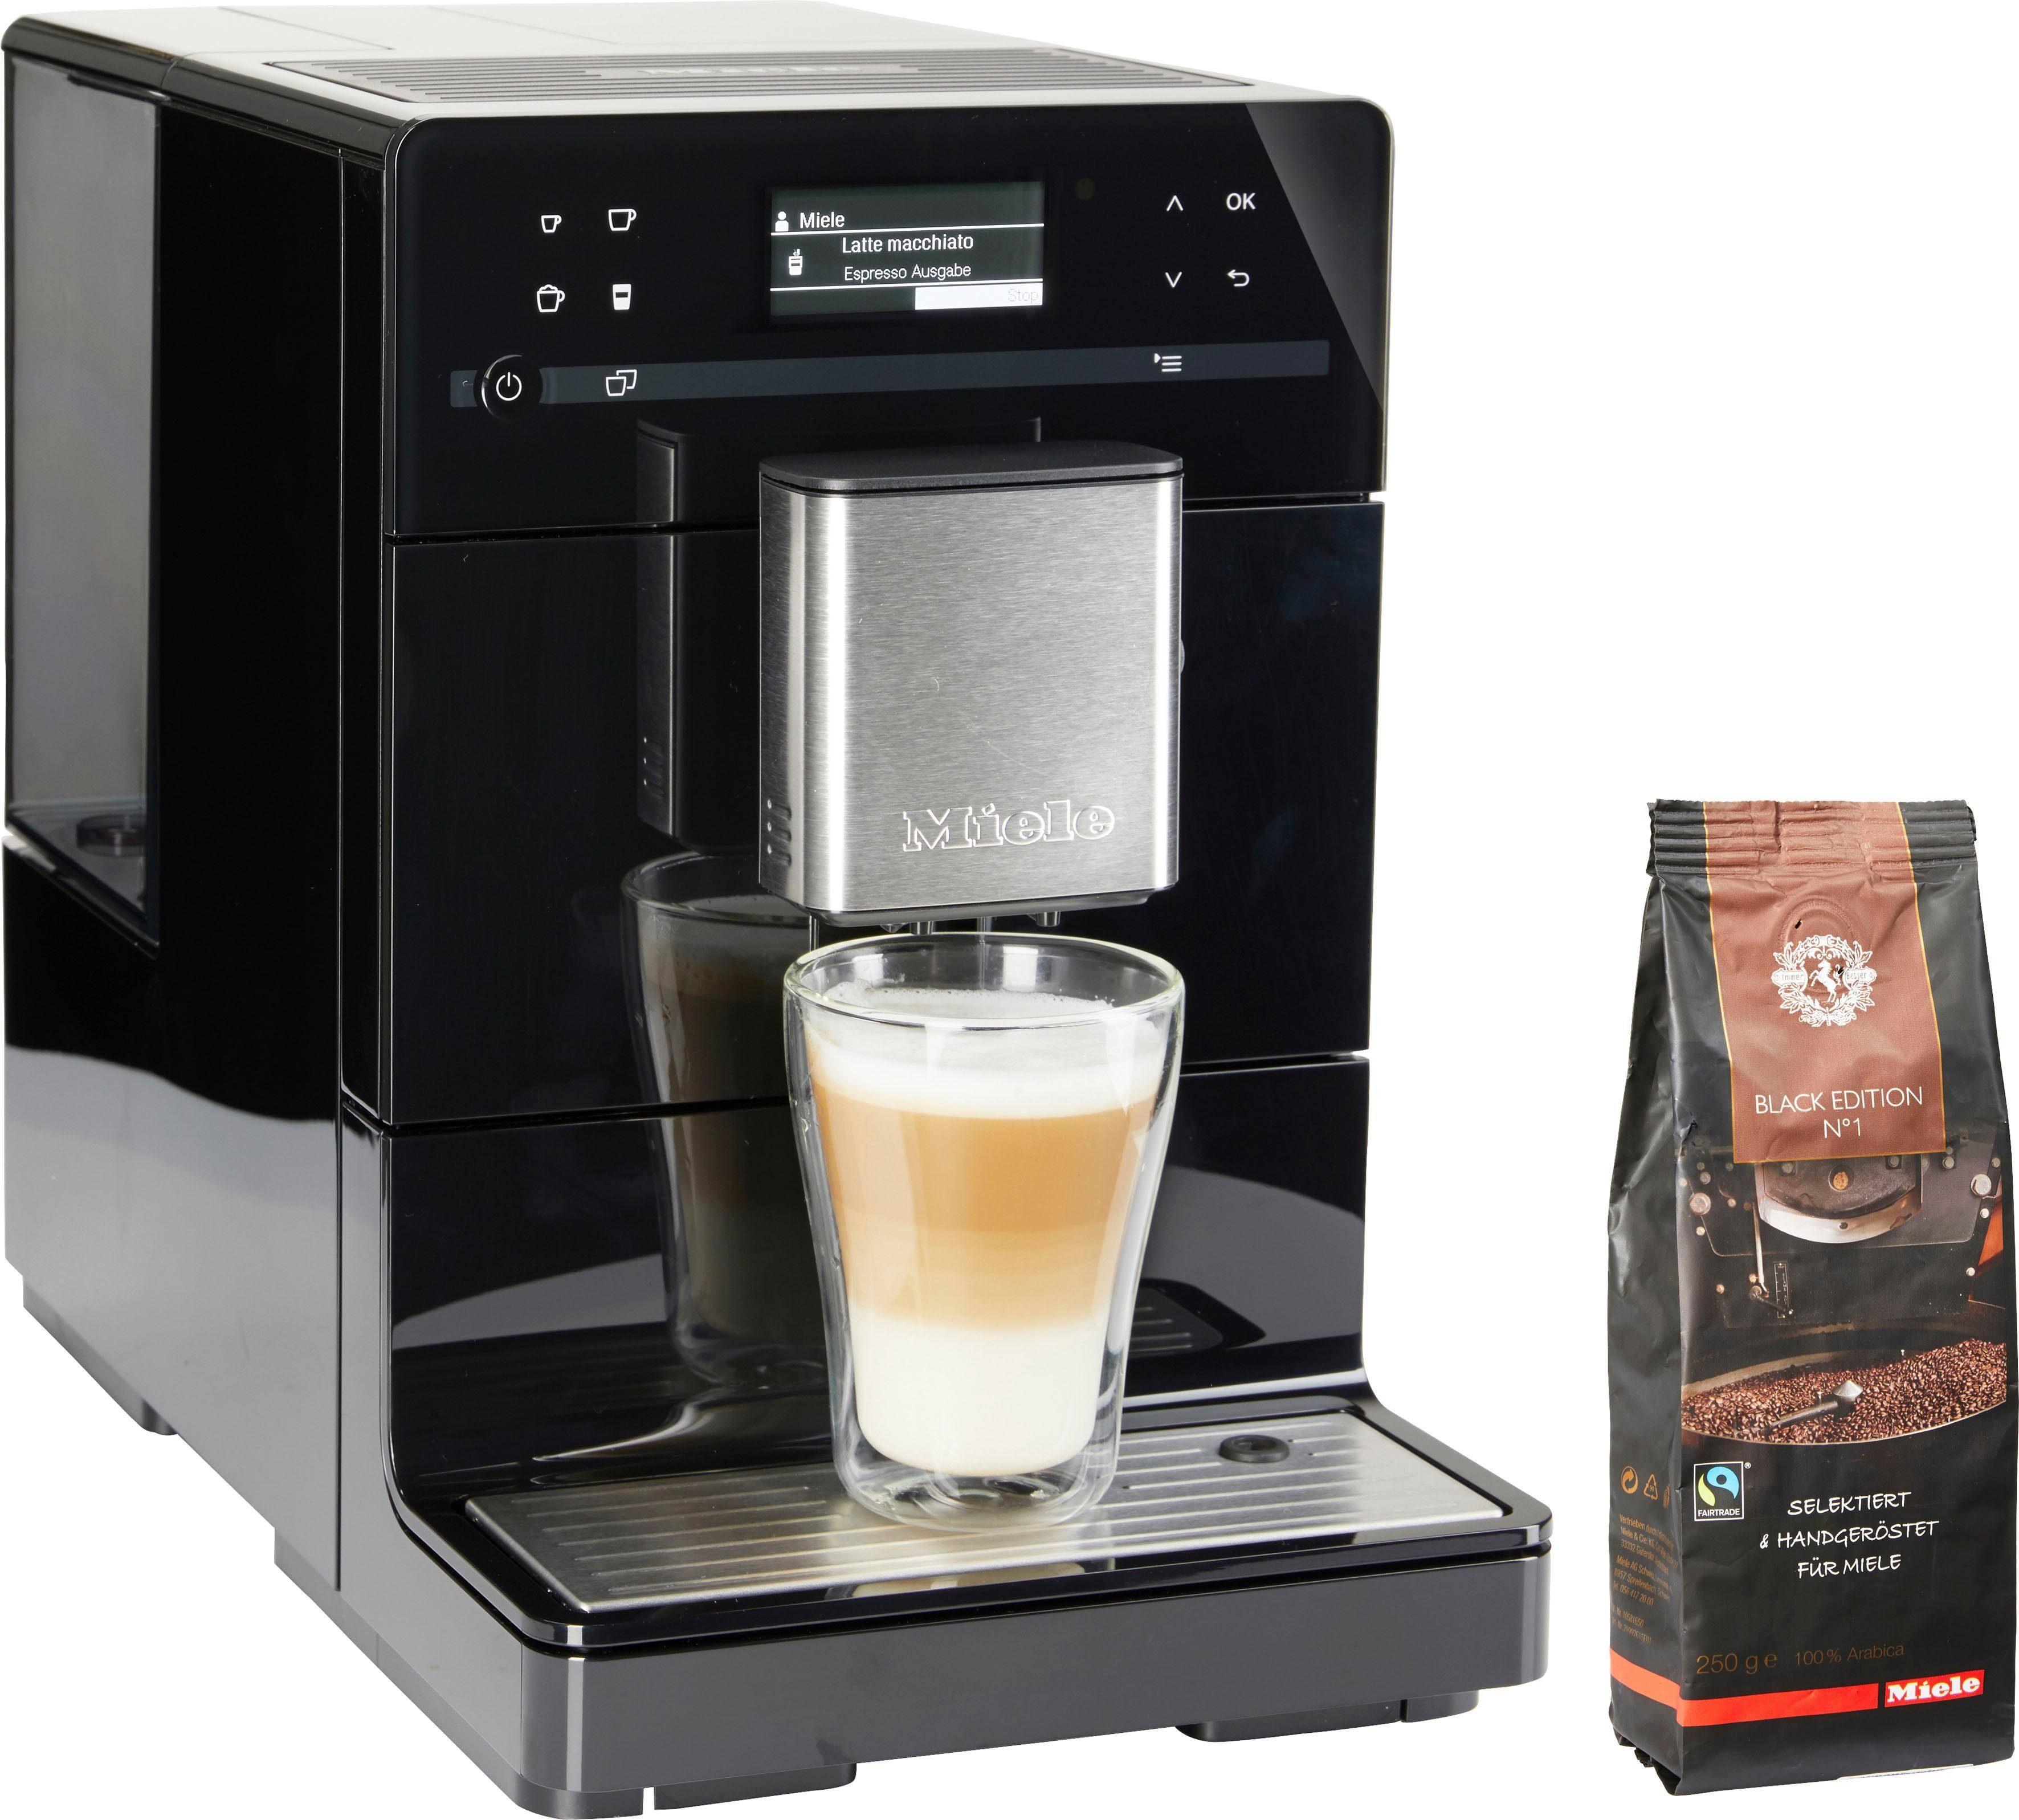 Miele Kaffeevollautomat CM 5400 Obsidianschwarz, individuelle Genießerprofile